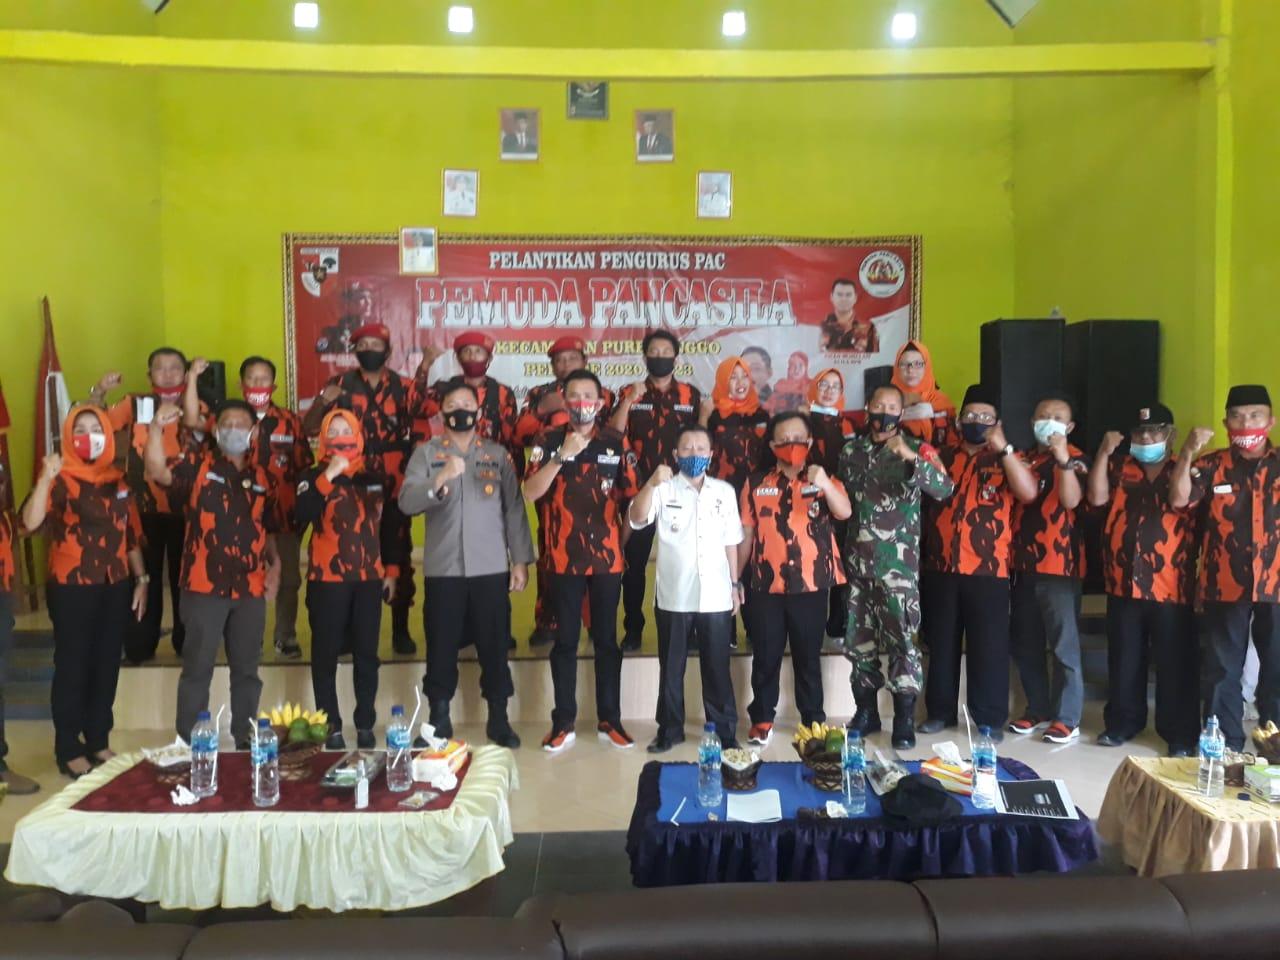 Hevzon Lantik Pengurus PAC Pemuda Pancasila Purbolinggo Periode 2020-2023